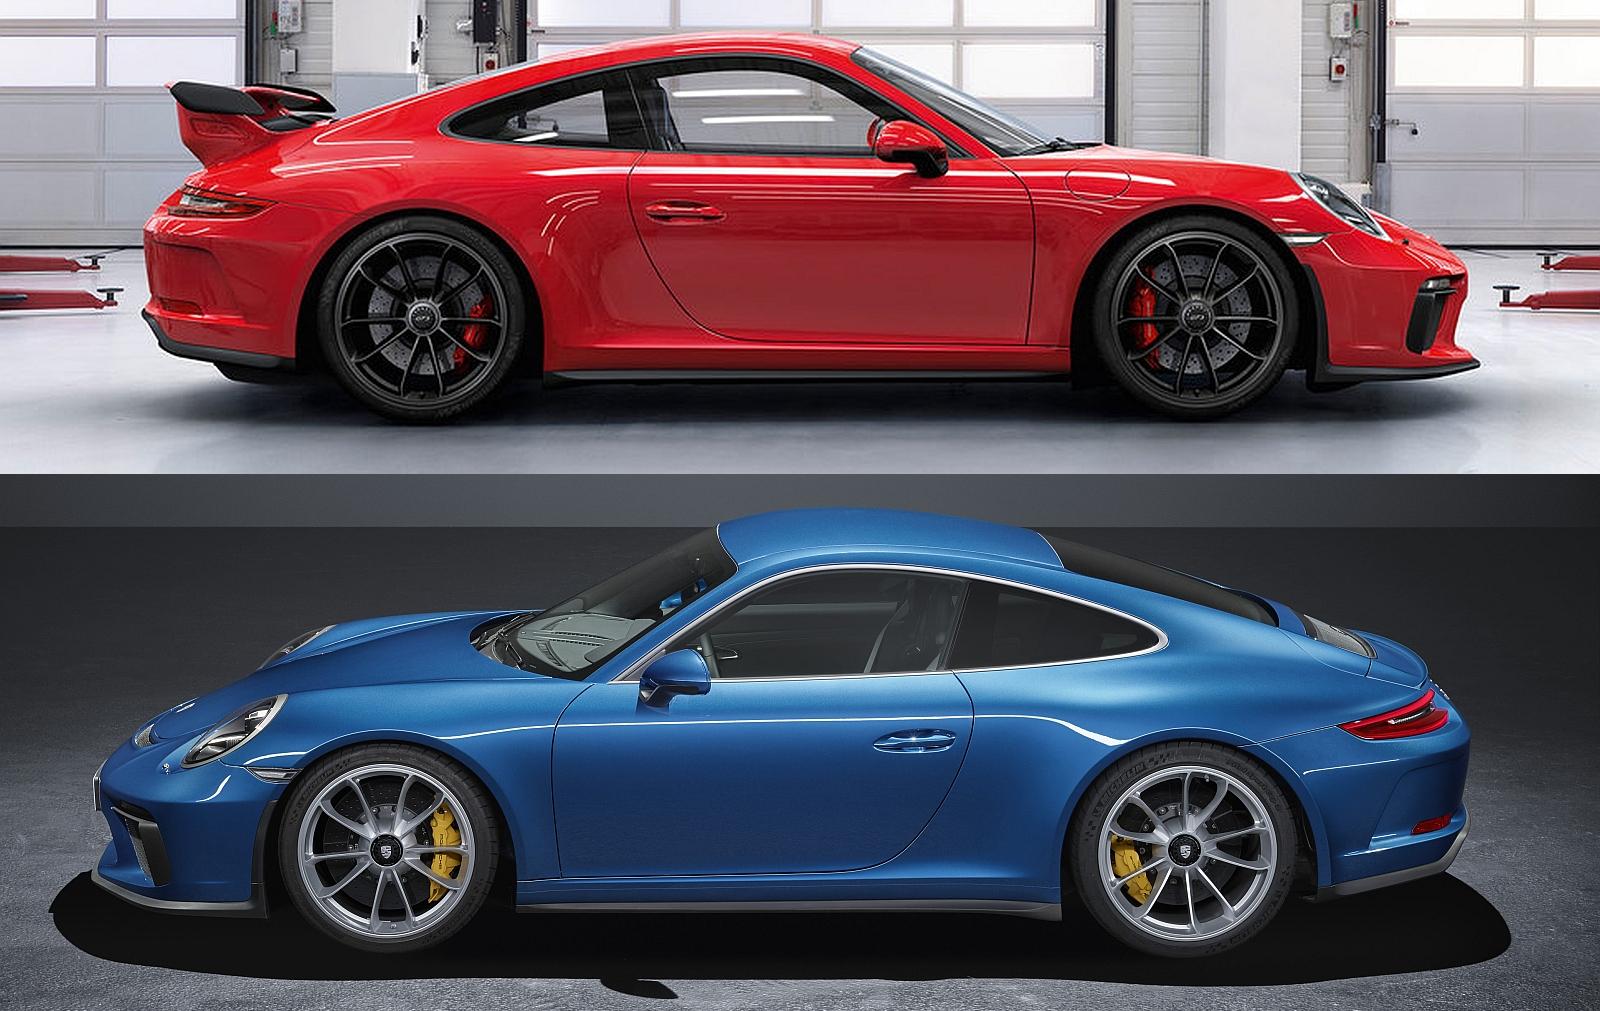 Porsche 911 GT3 versus 911 GT3 Touring Package